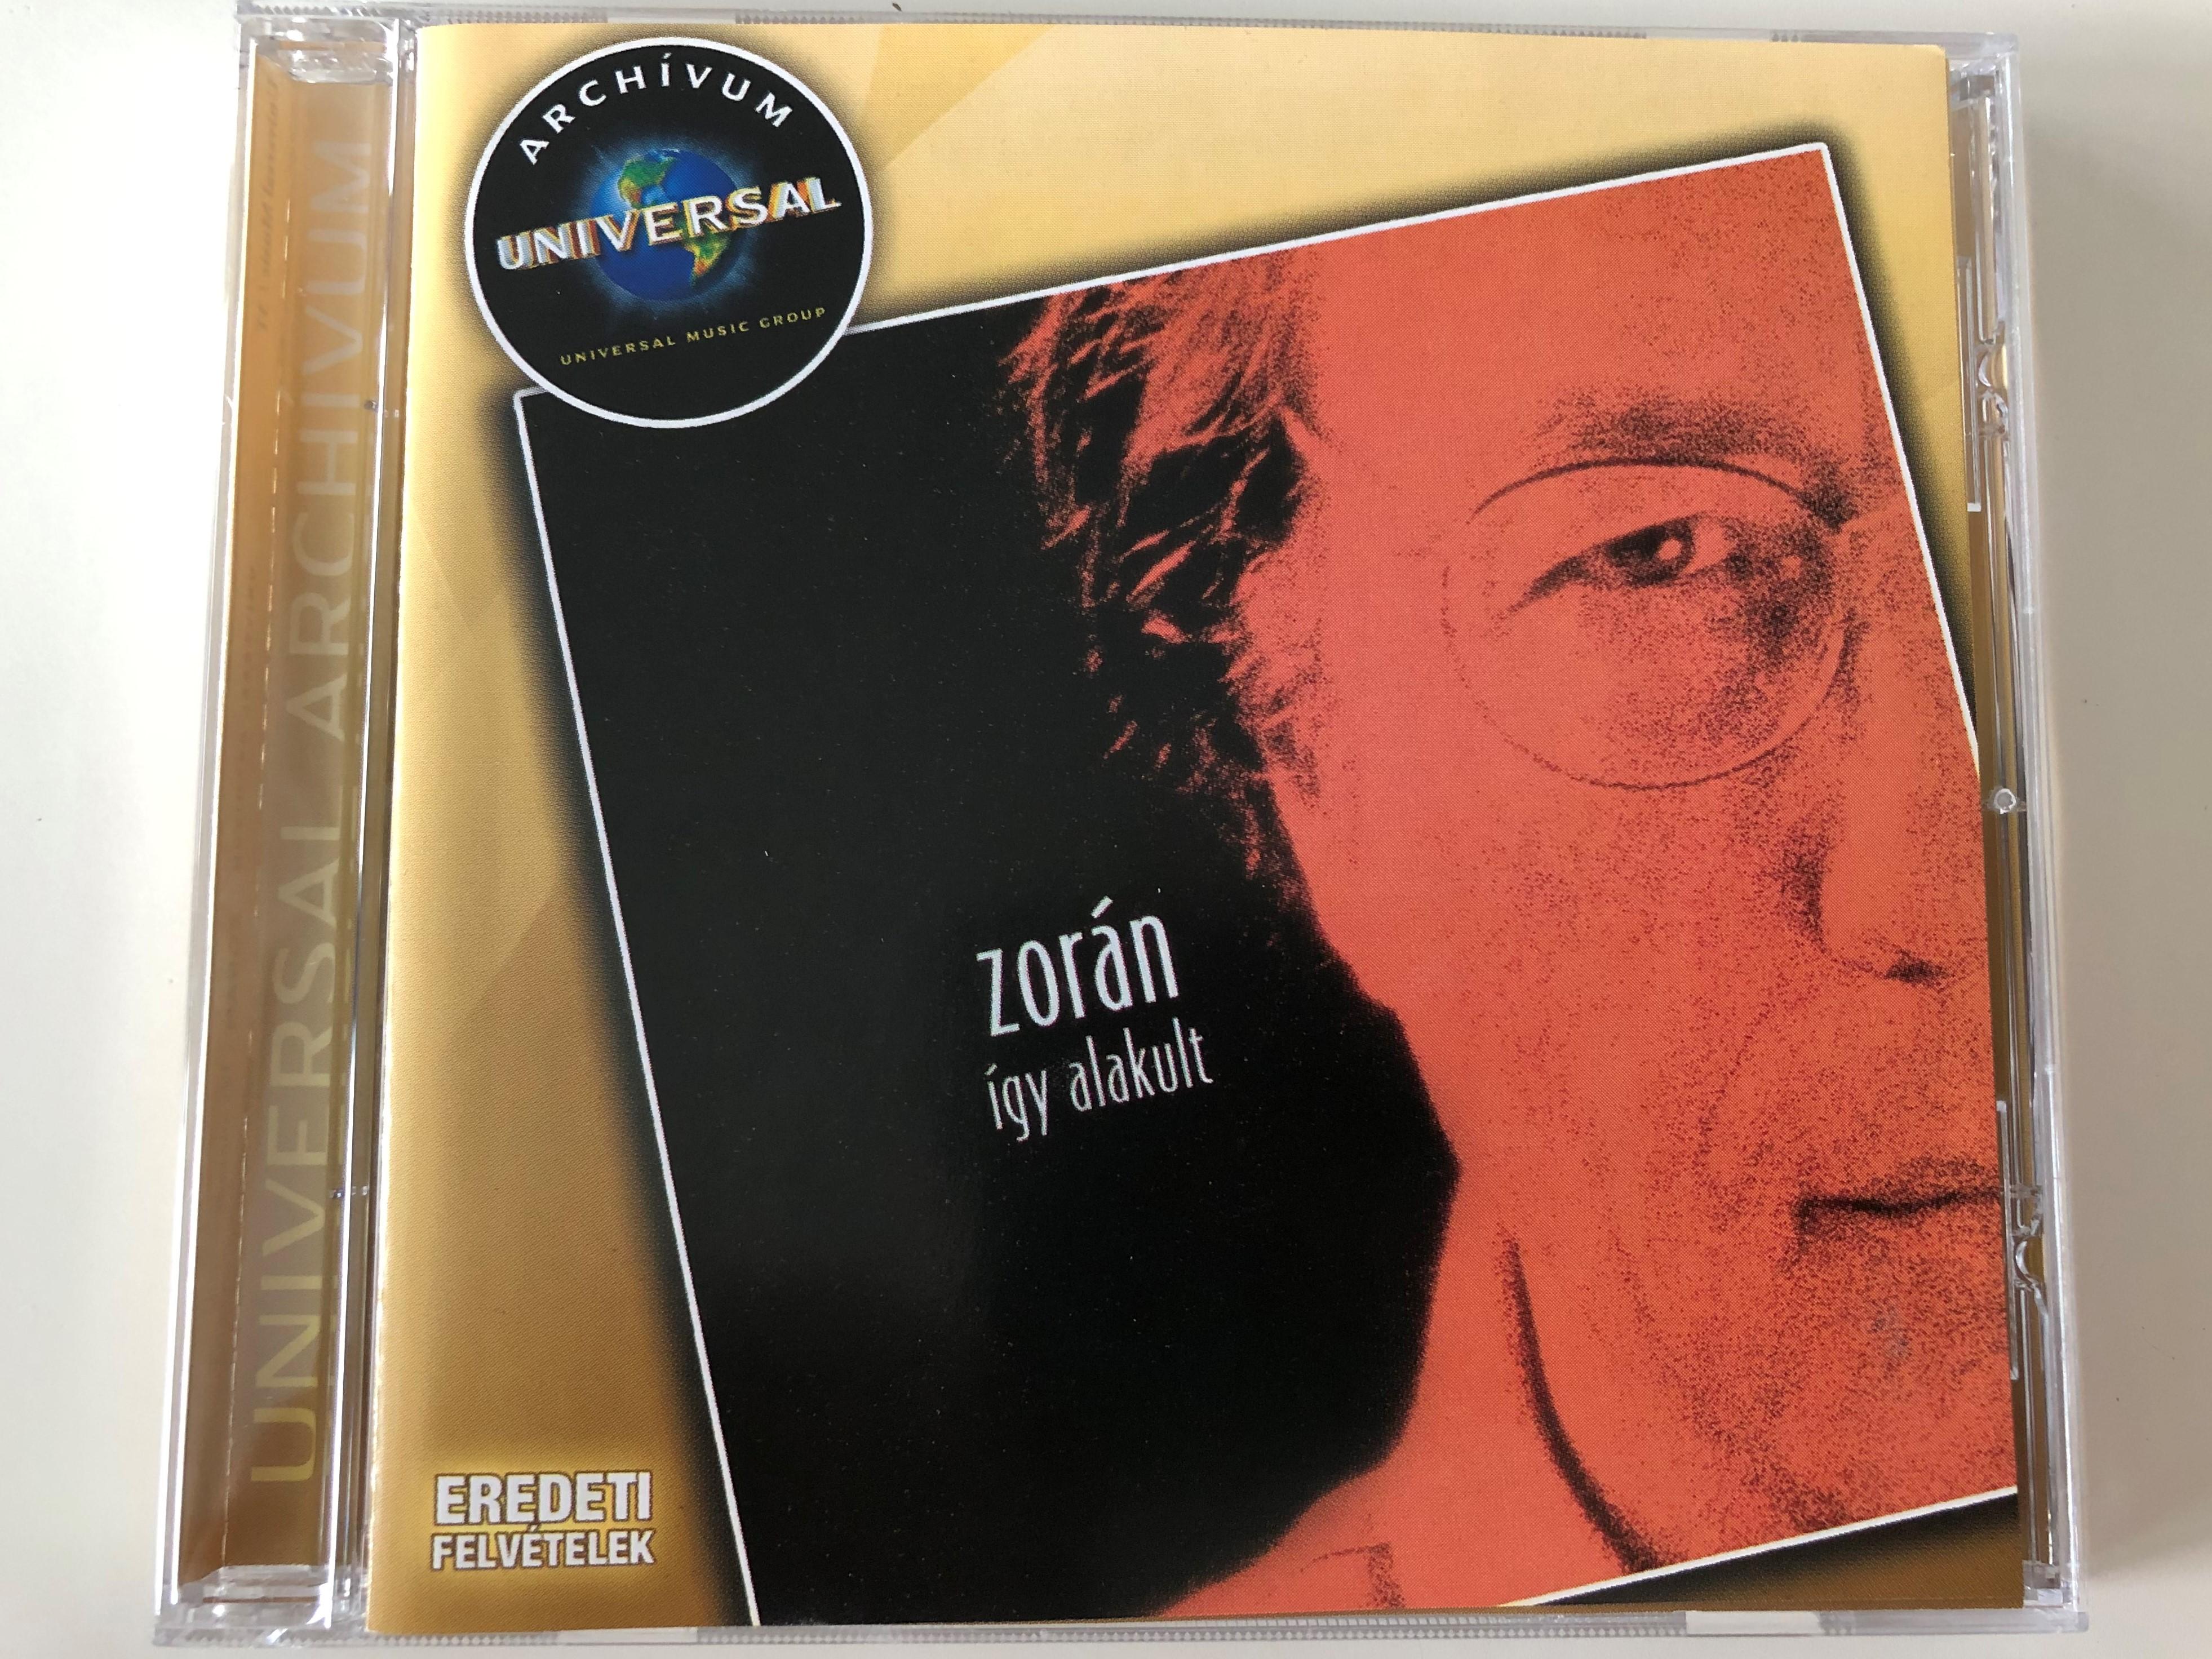 zor-n-gy-alakult-universal-music-kft.-audio-cd-2007-1754646-1-.jpg